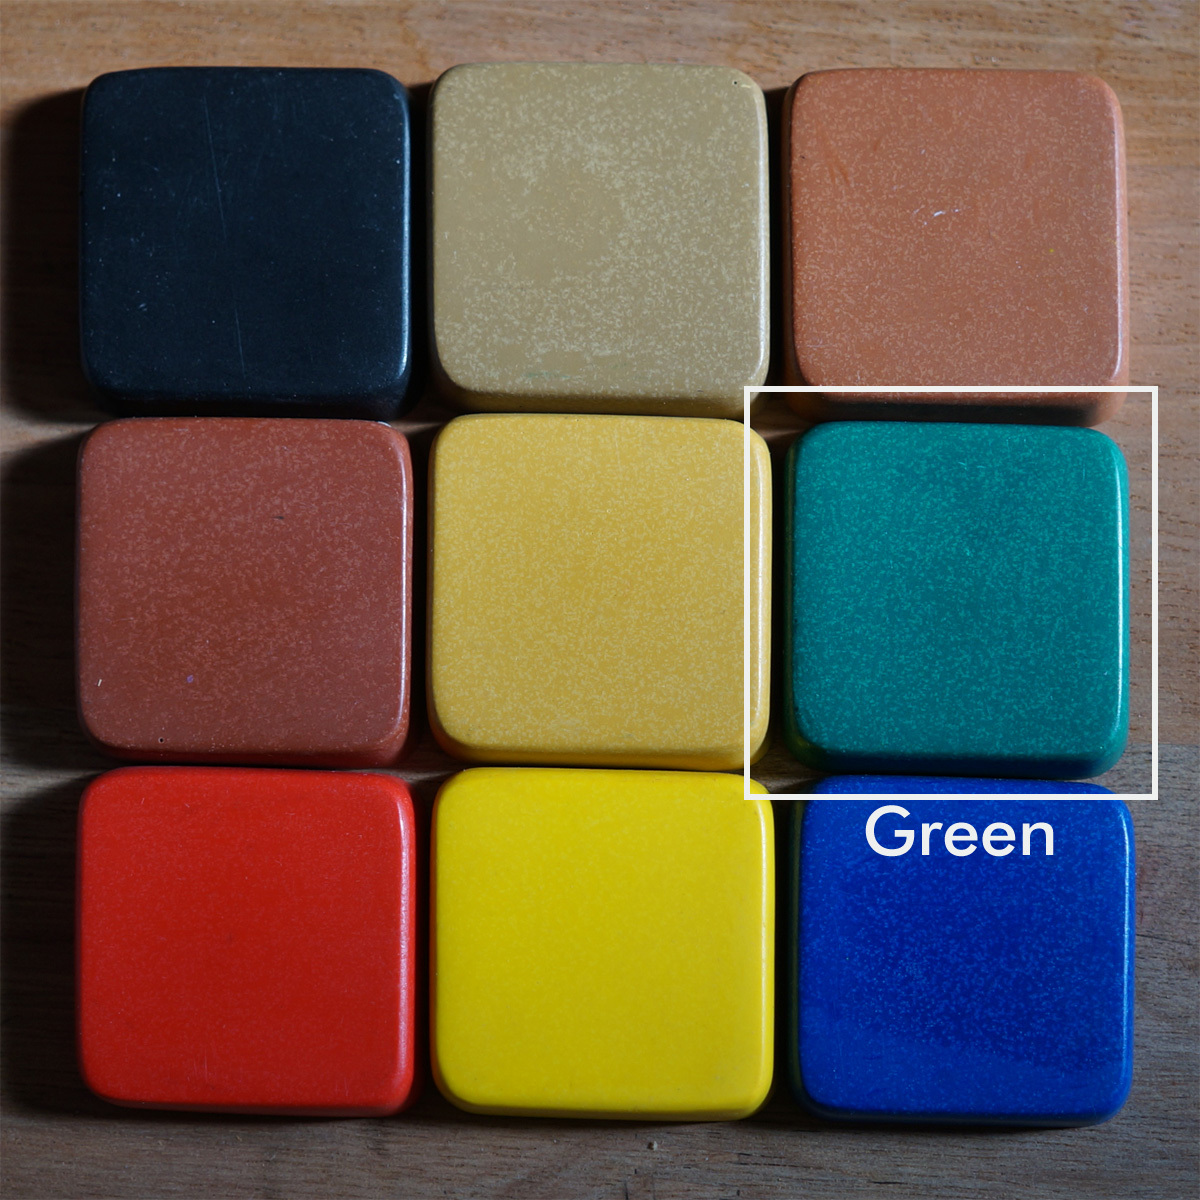 PIGMENT GREEN 1kg(着色剤:緑 1kg) - 画像2